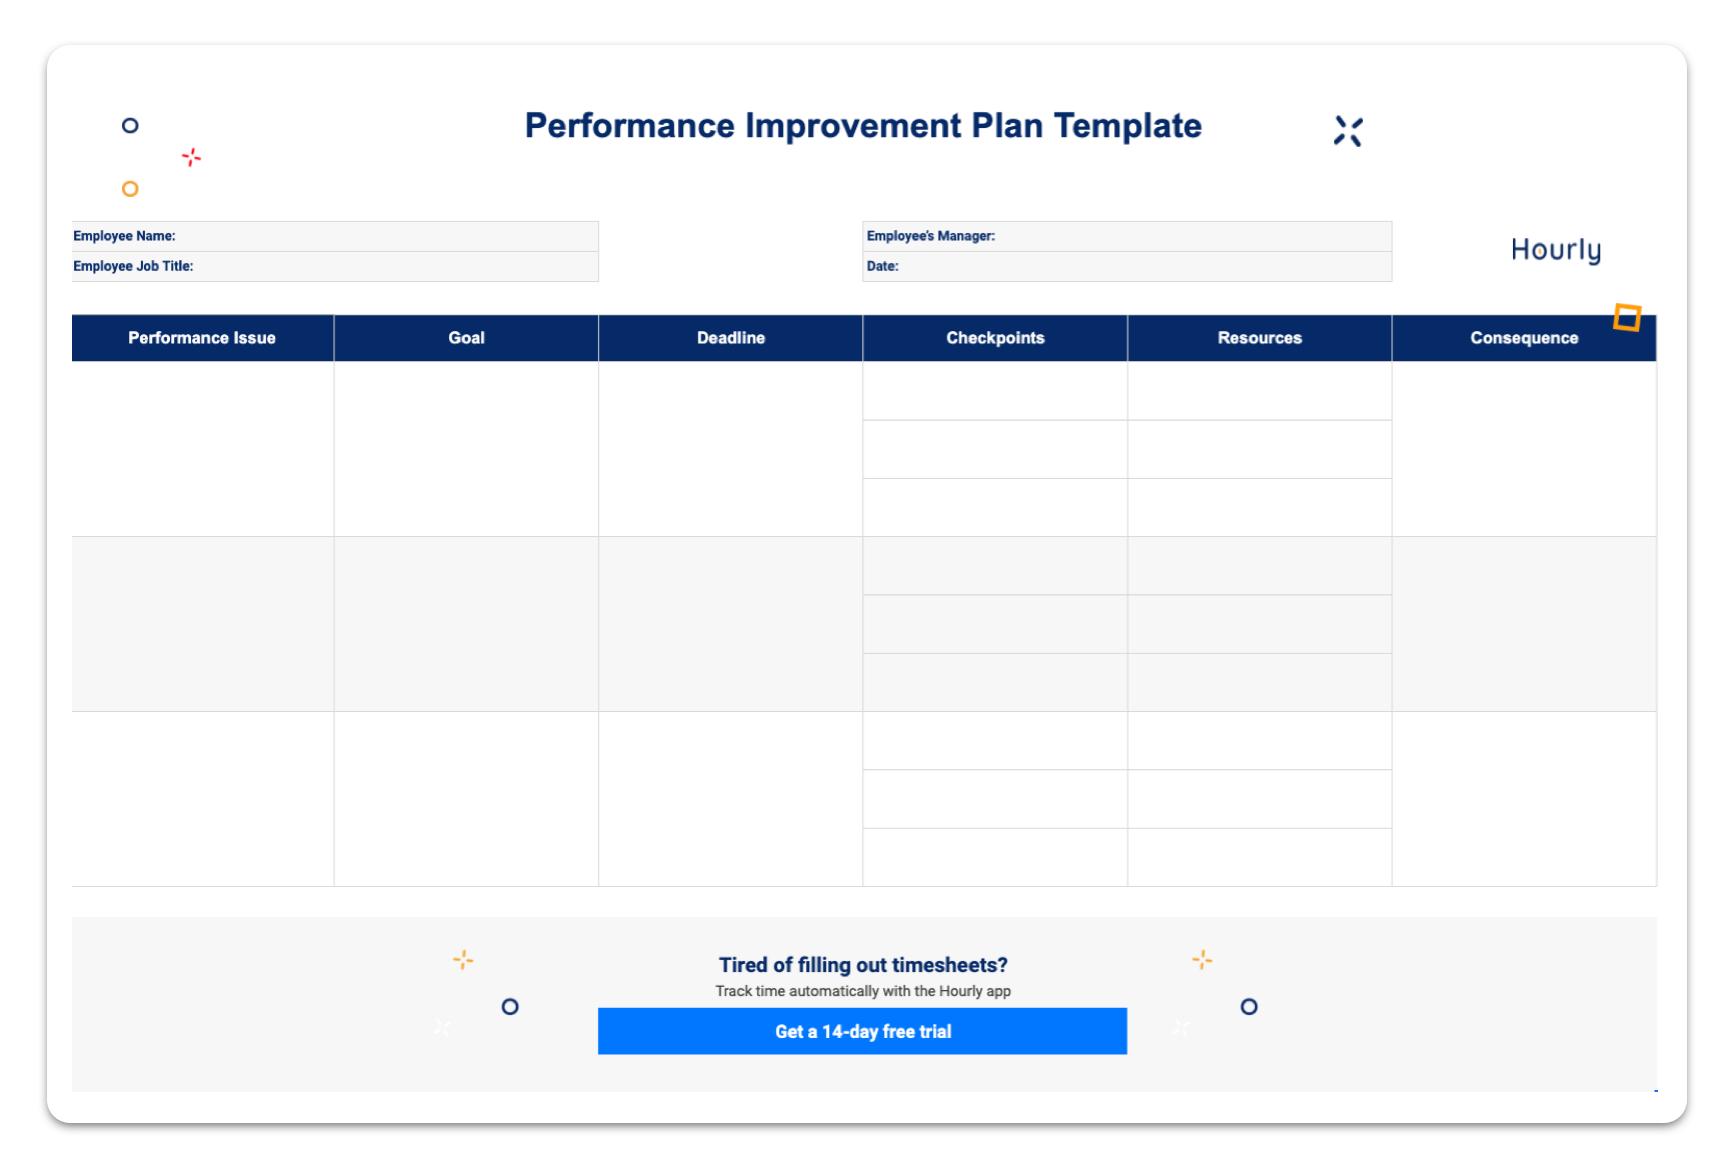 Performance improvement plan sample template.